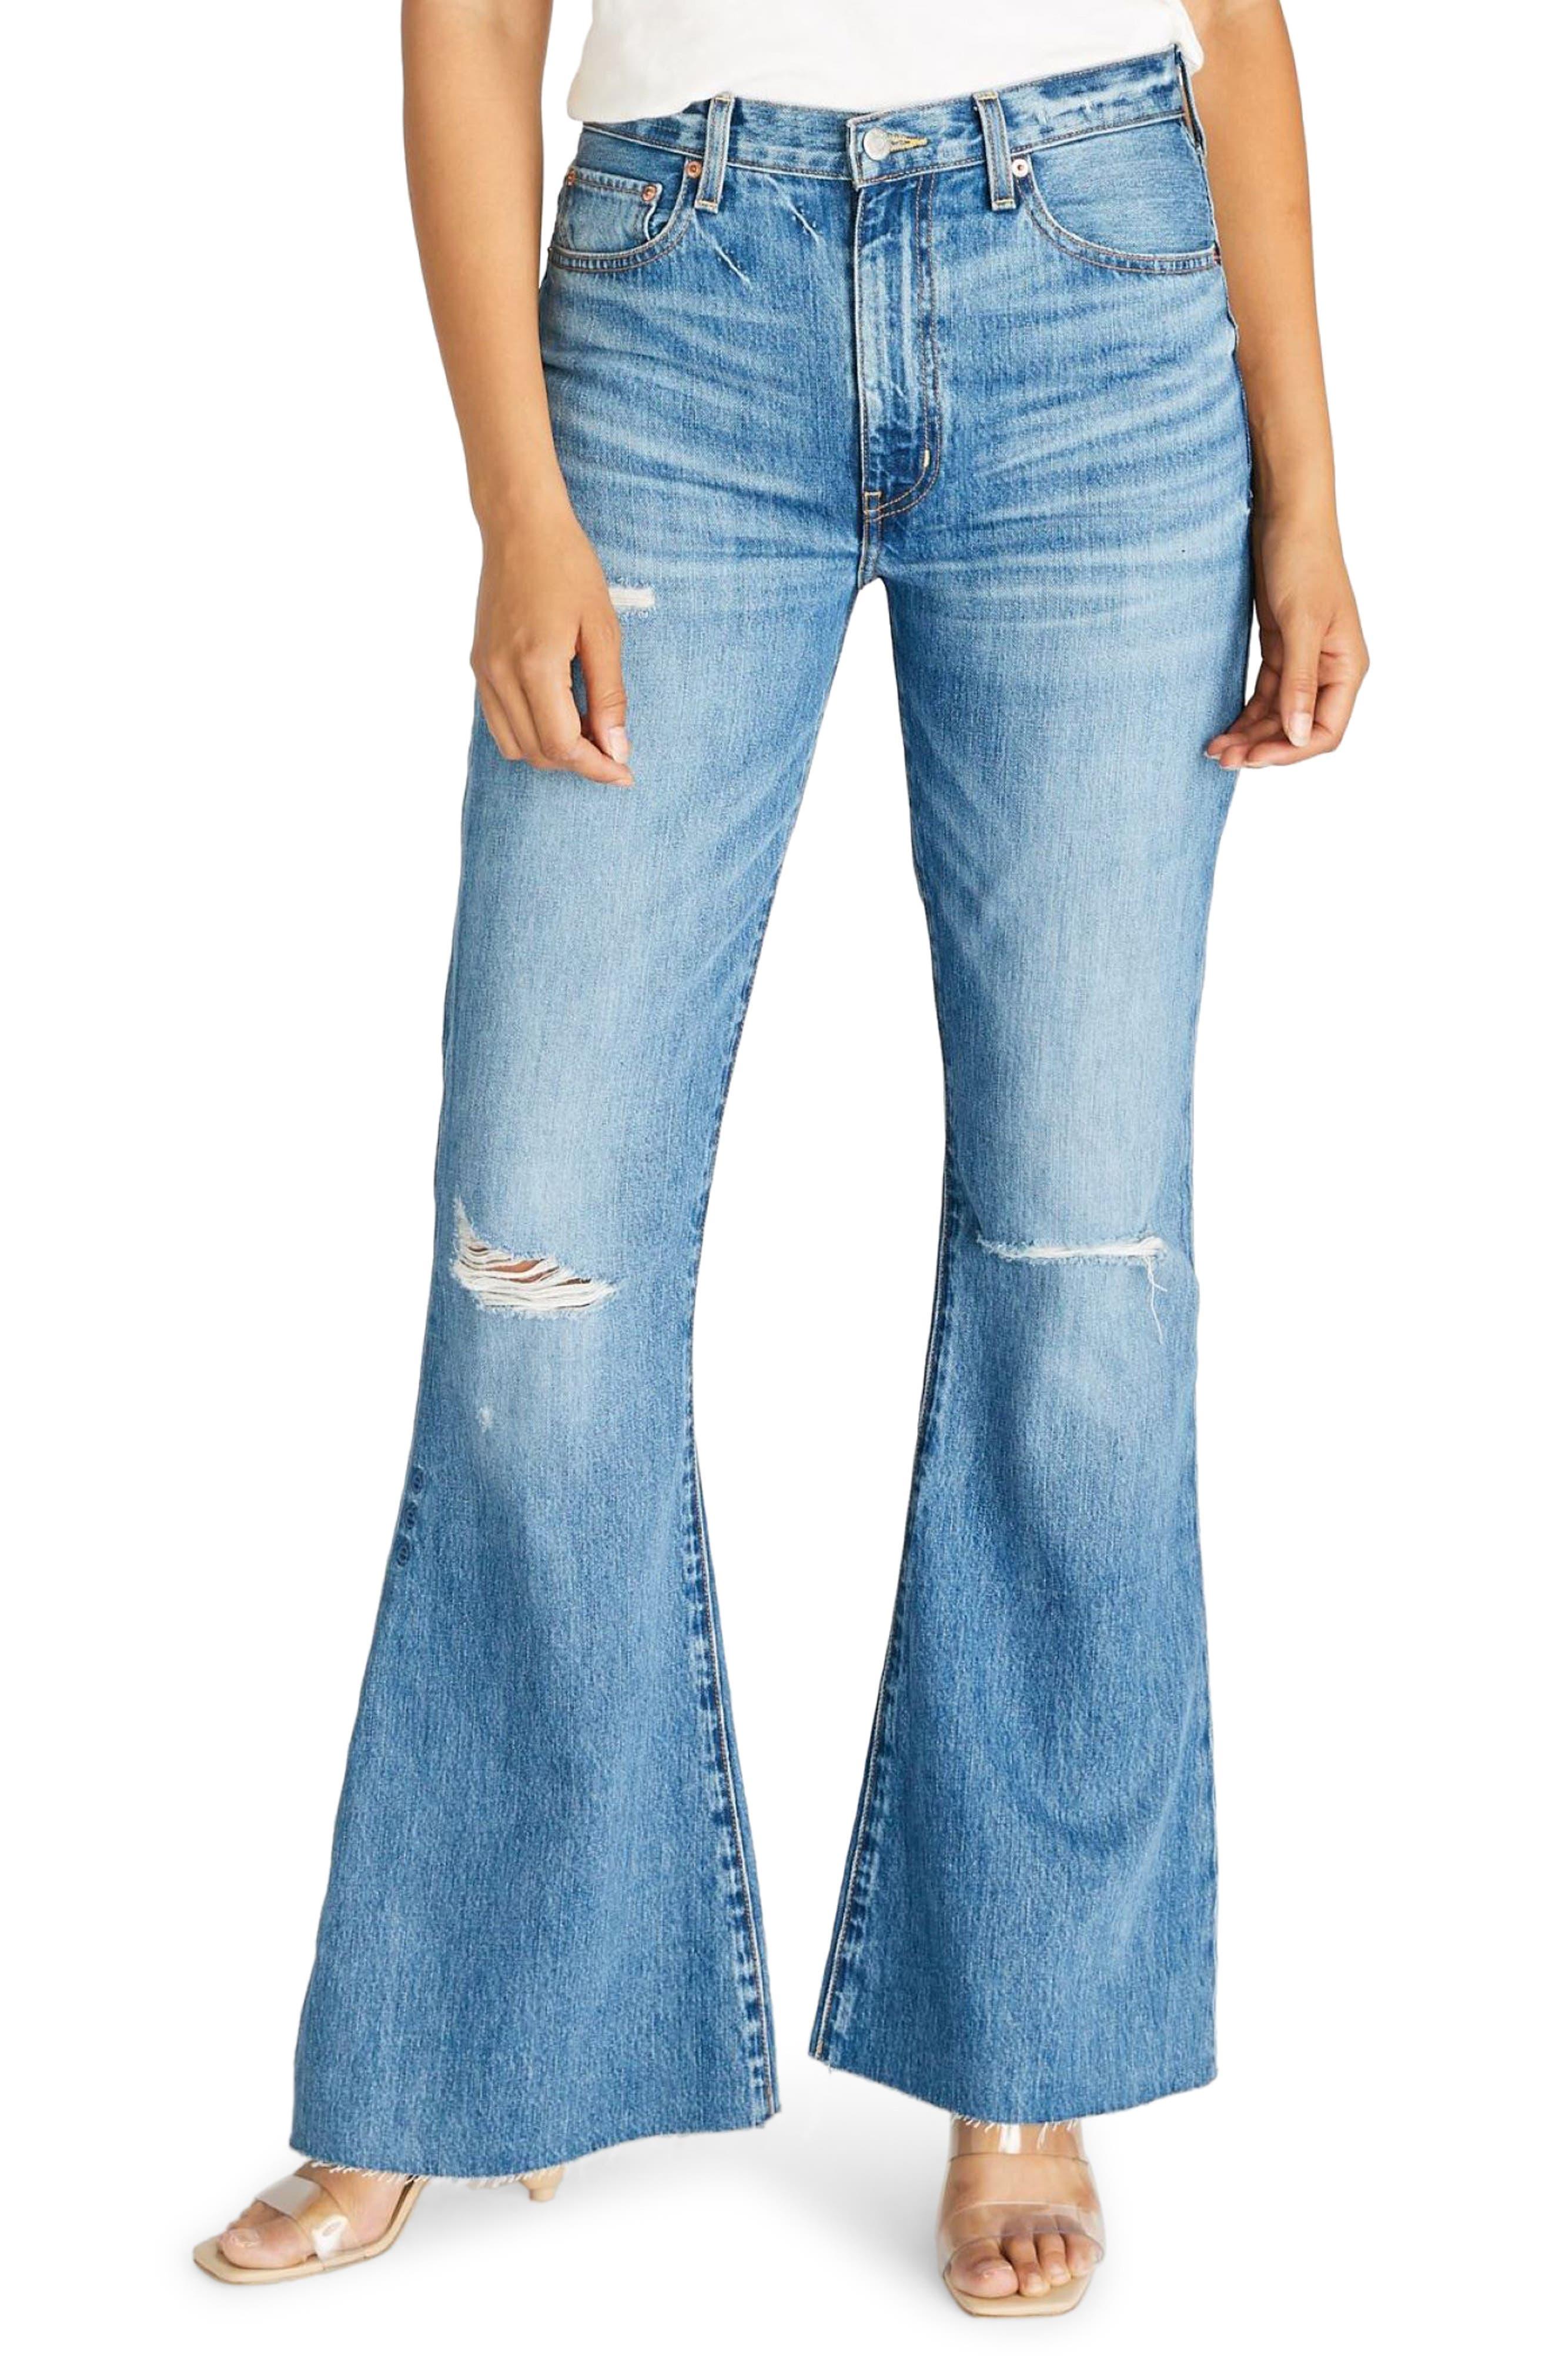 Women's Etica Nina High Waist Distressed Flare Jeans